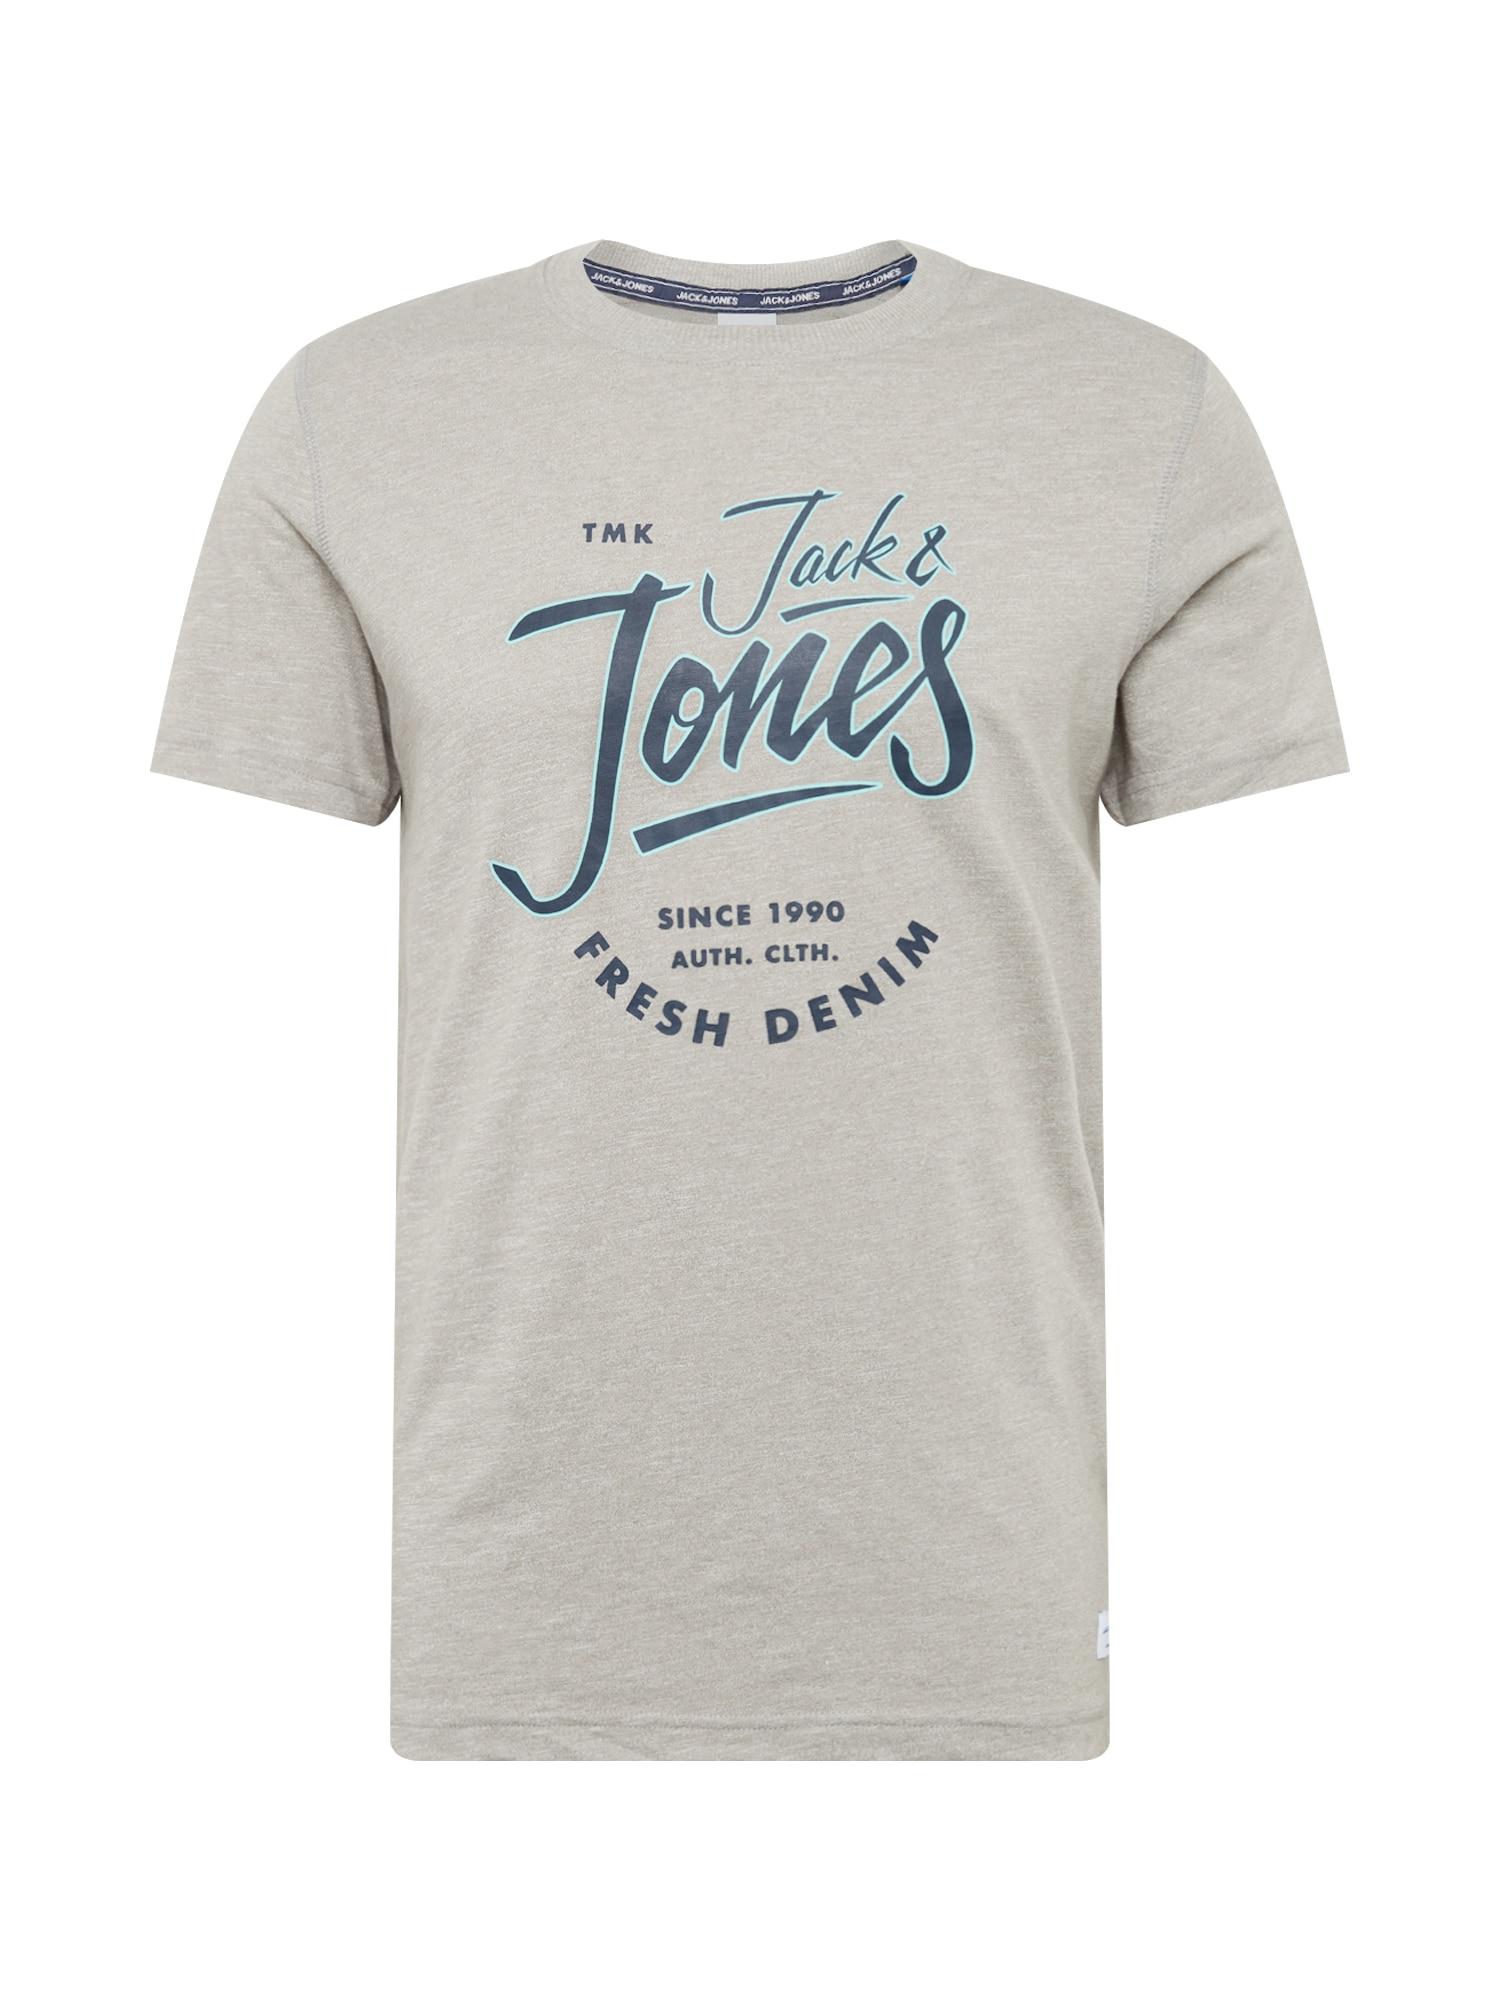 Tričko BEAMS TEE tmavě modrá světle šedá JACK & JONES